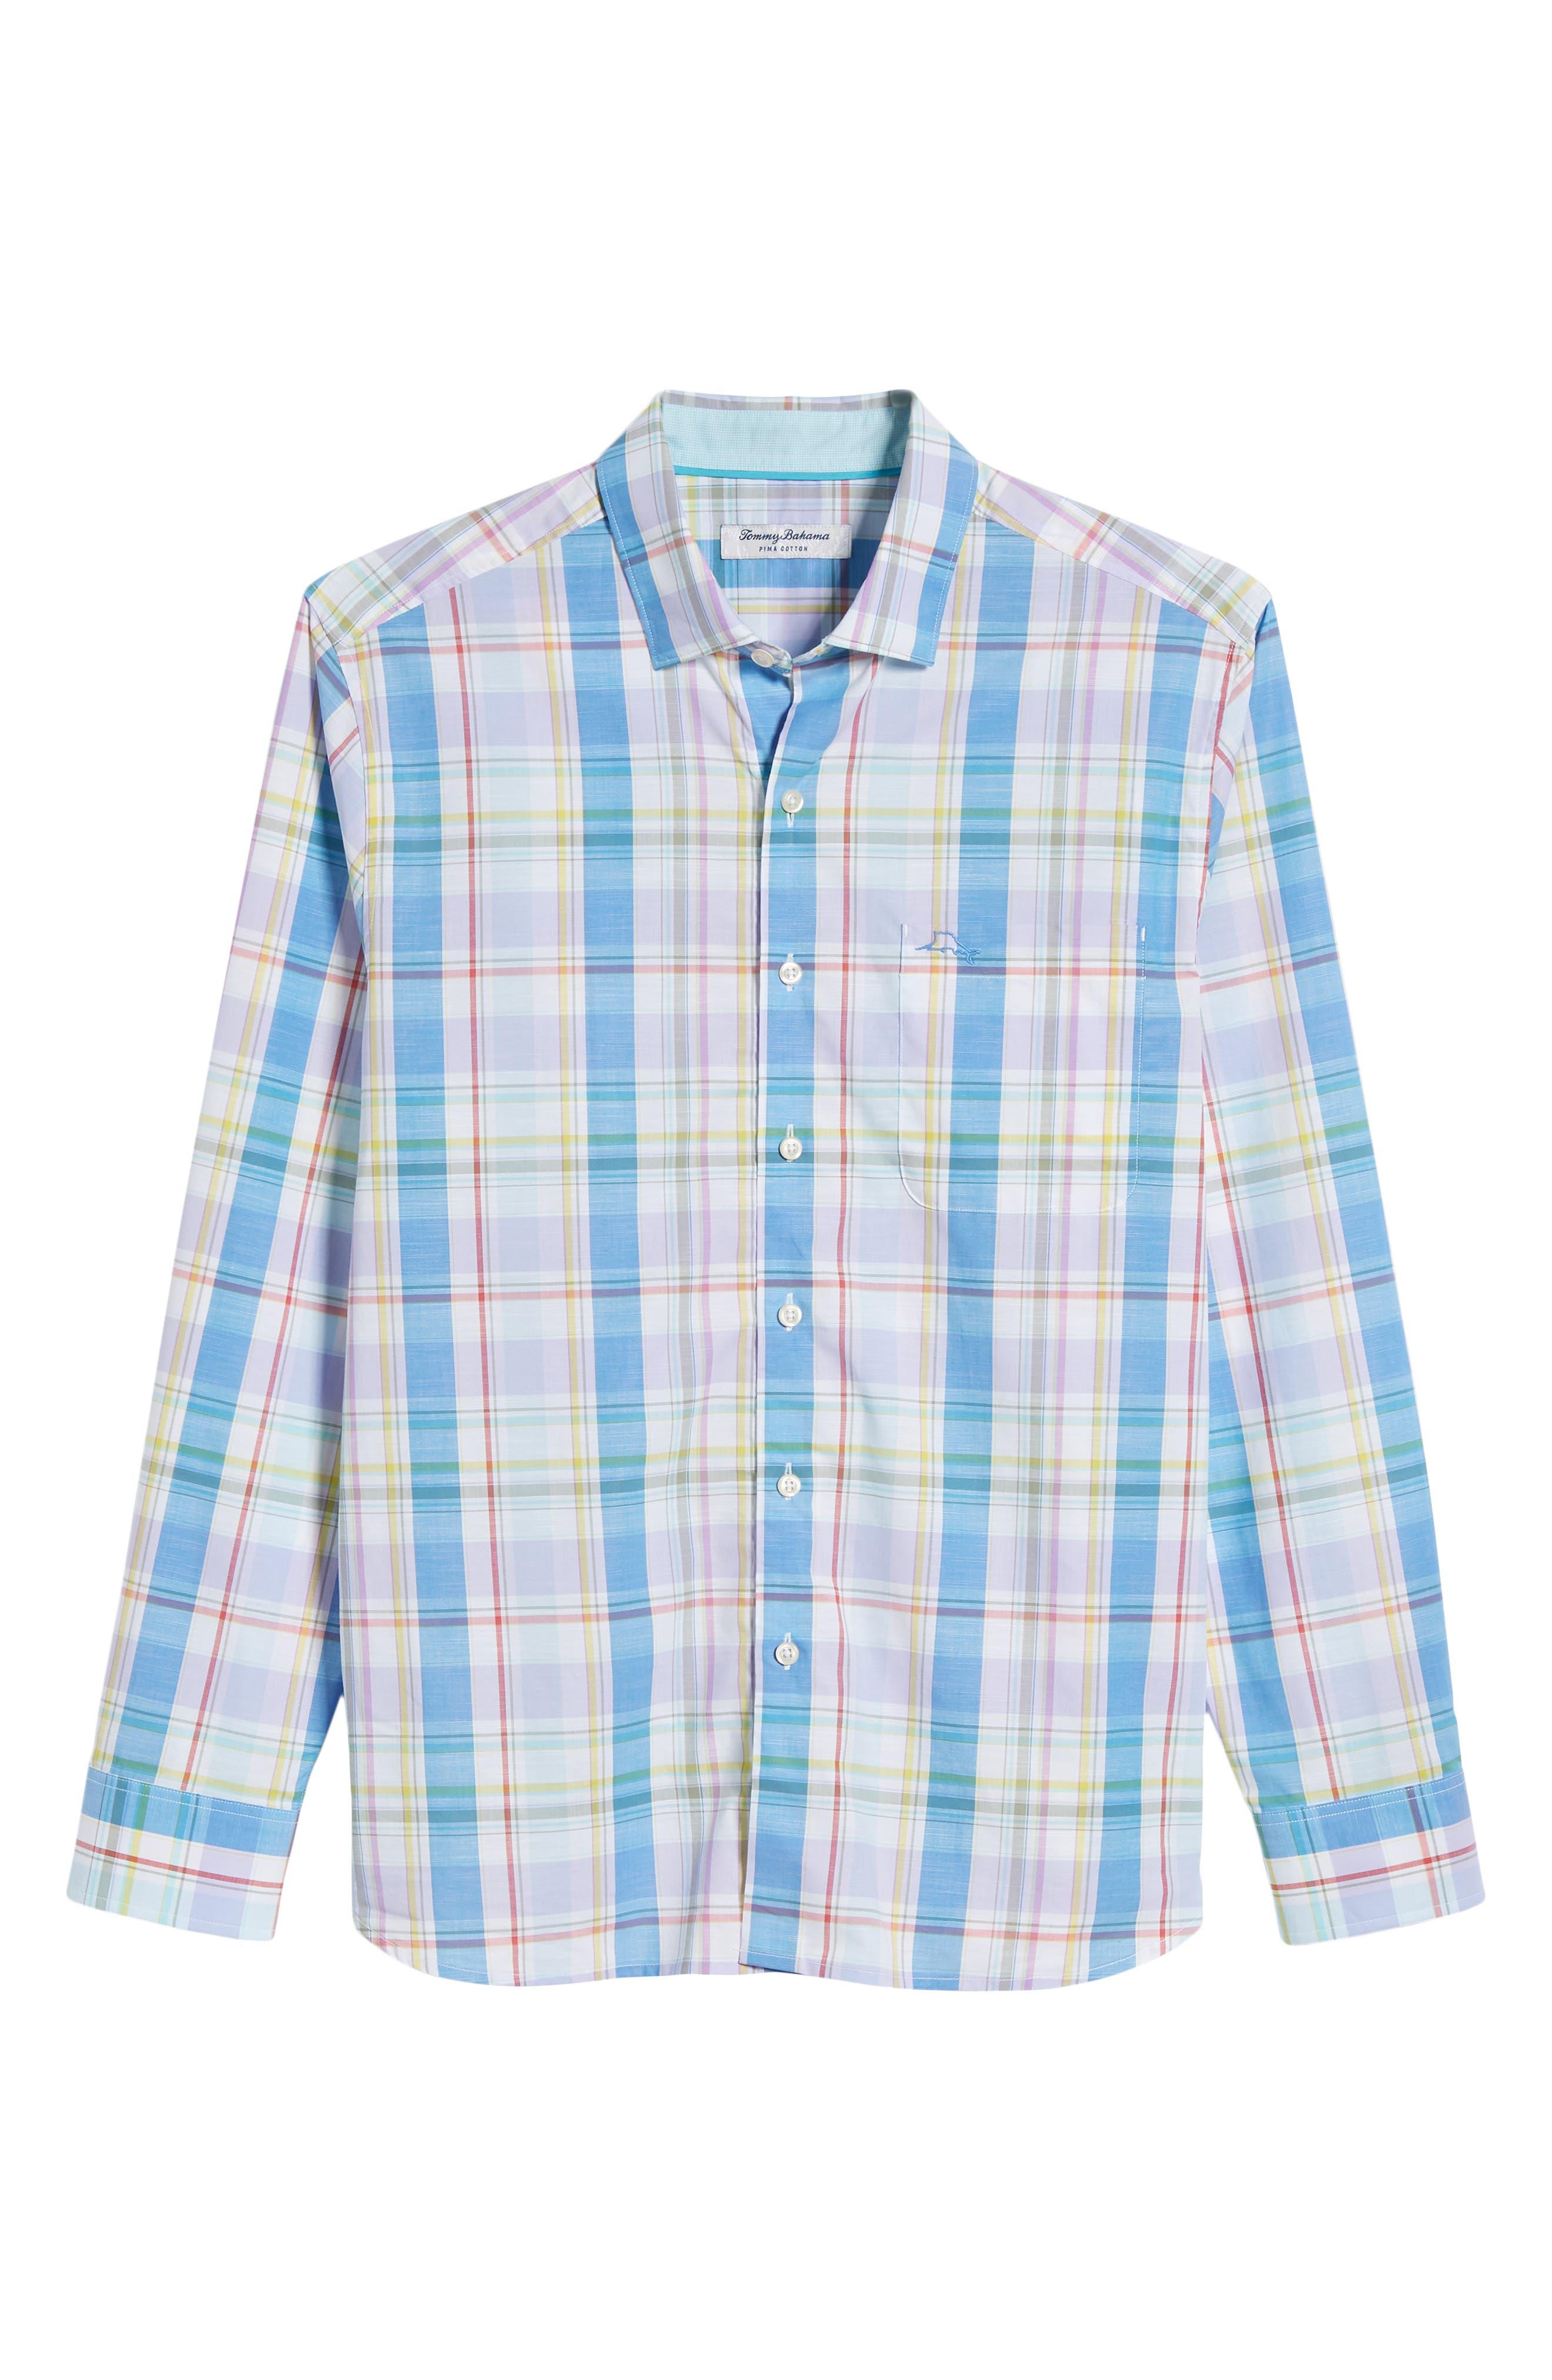 Privada Plaid Sport Shirt,                             Alternate thumbnail 6, color,                             Blue Aster